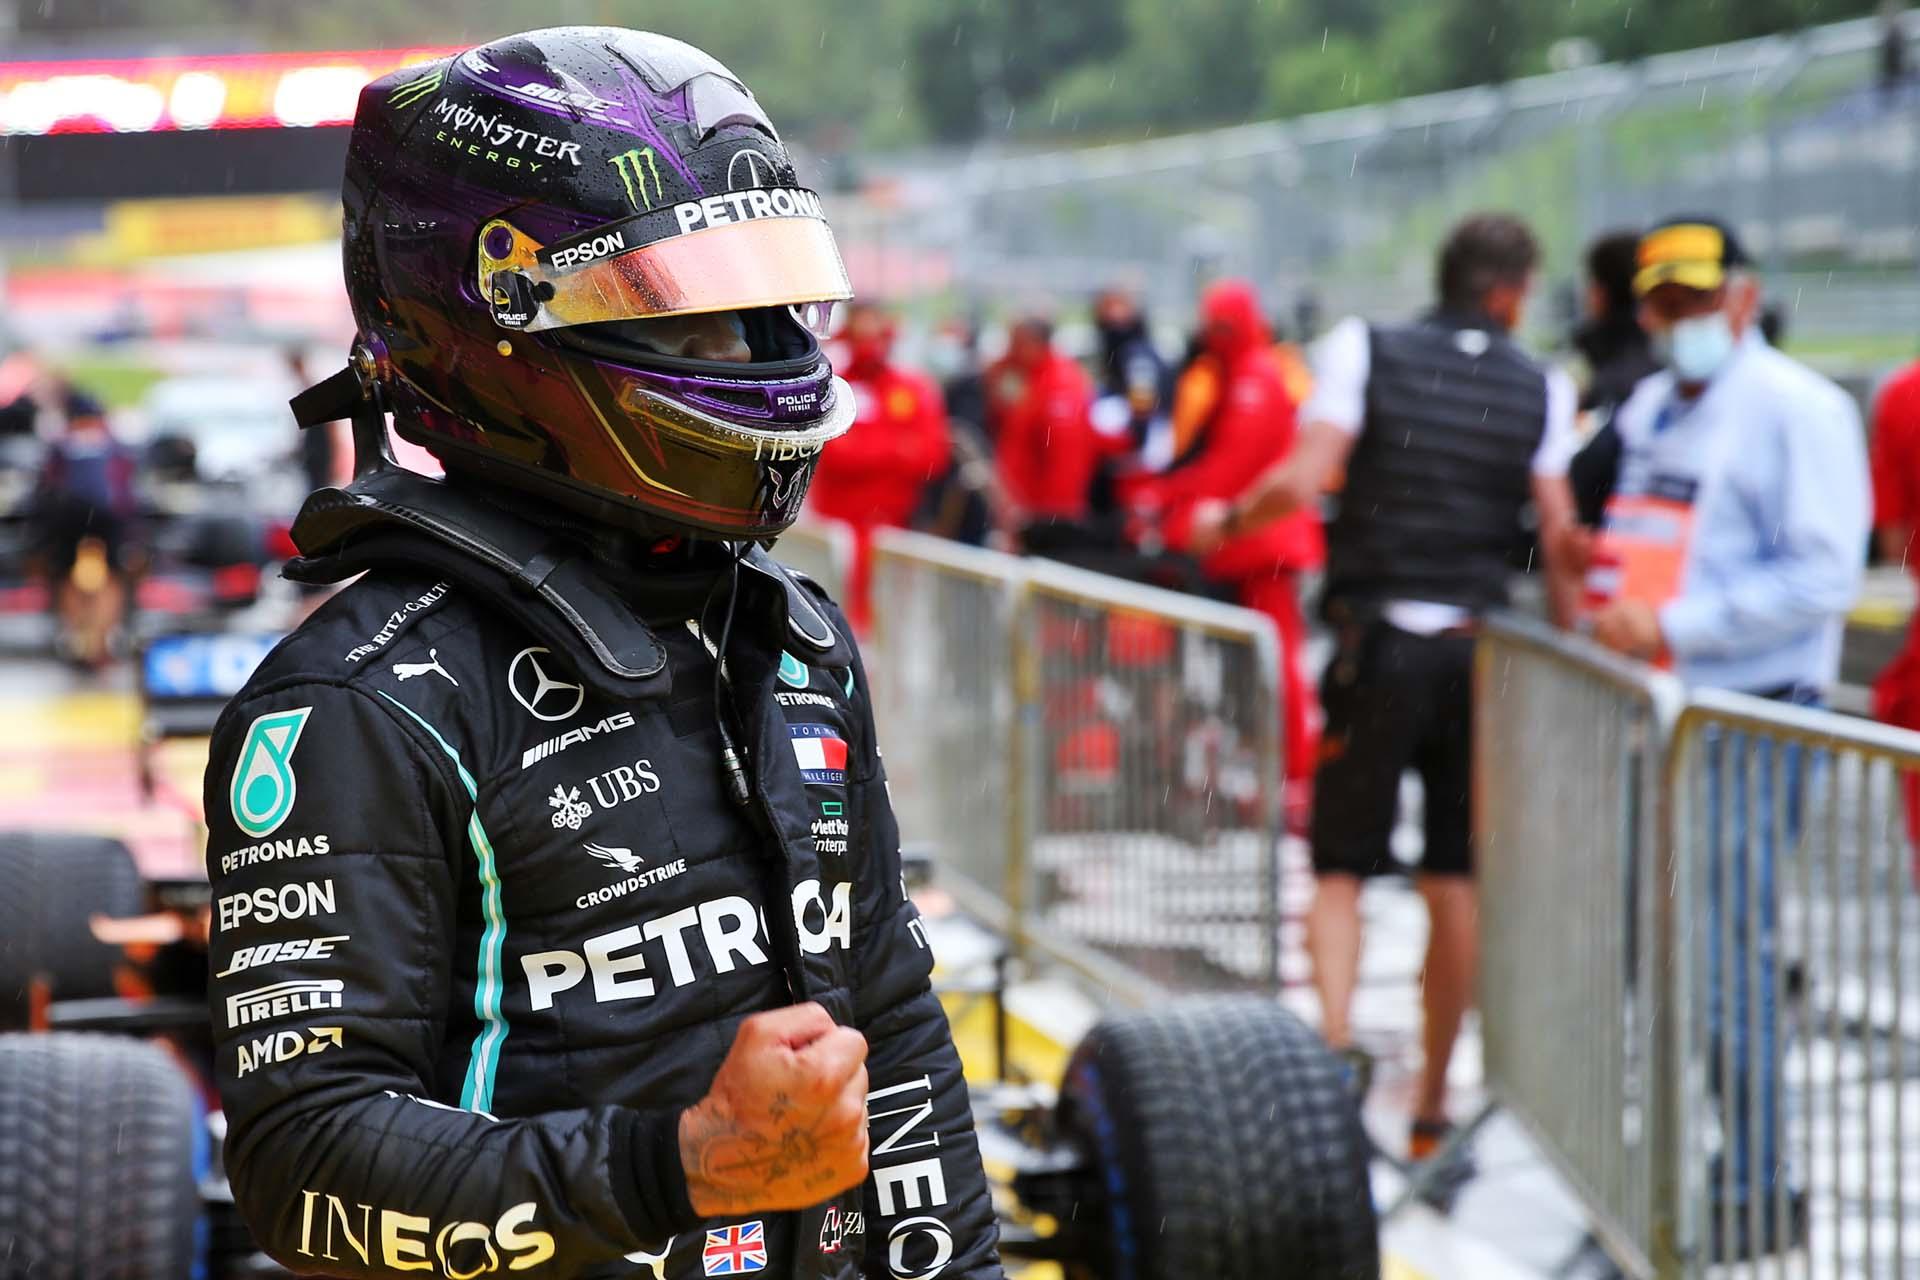 2020 Styrian Grand Prix, Saturday - LAT Images